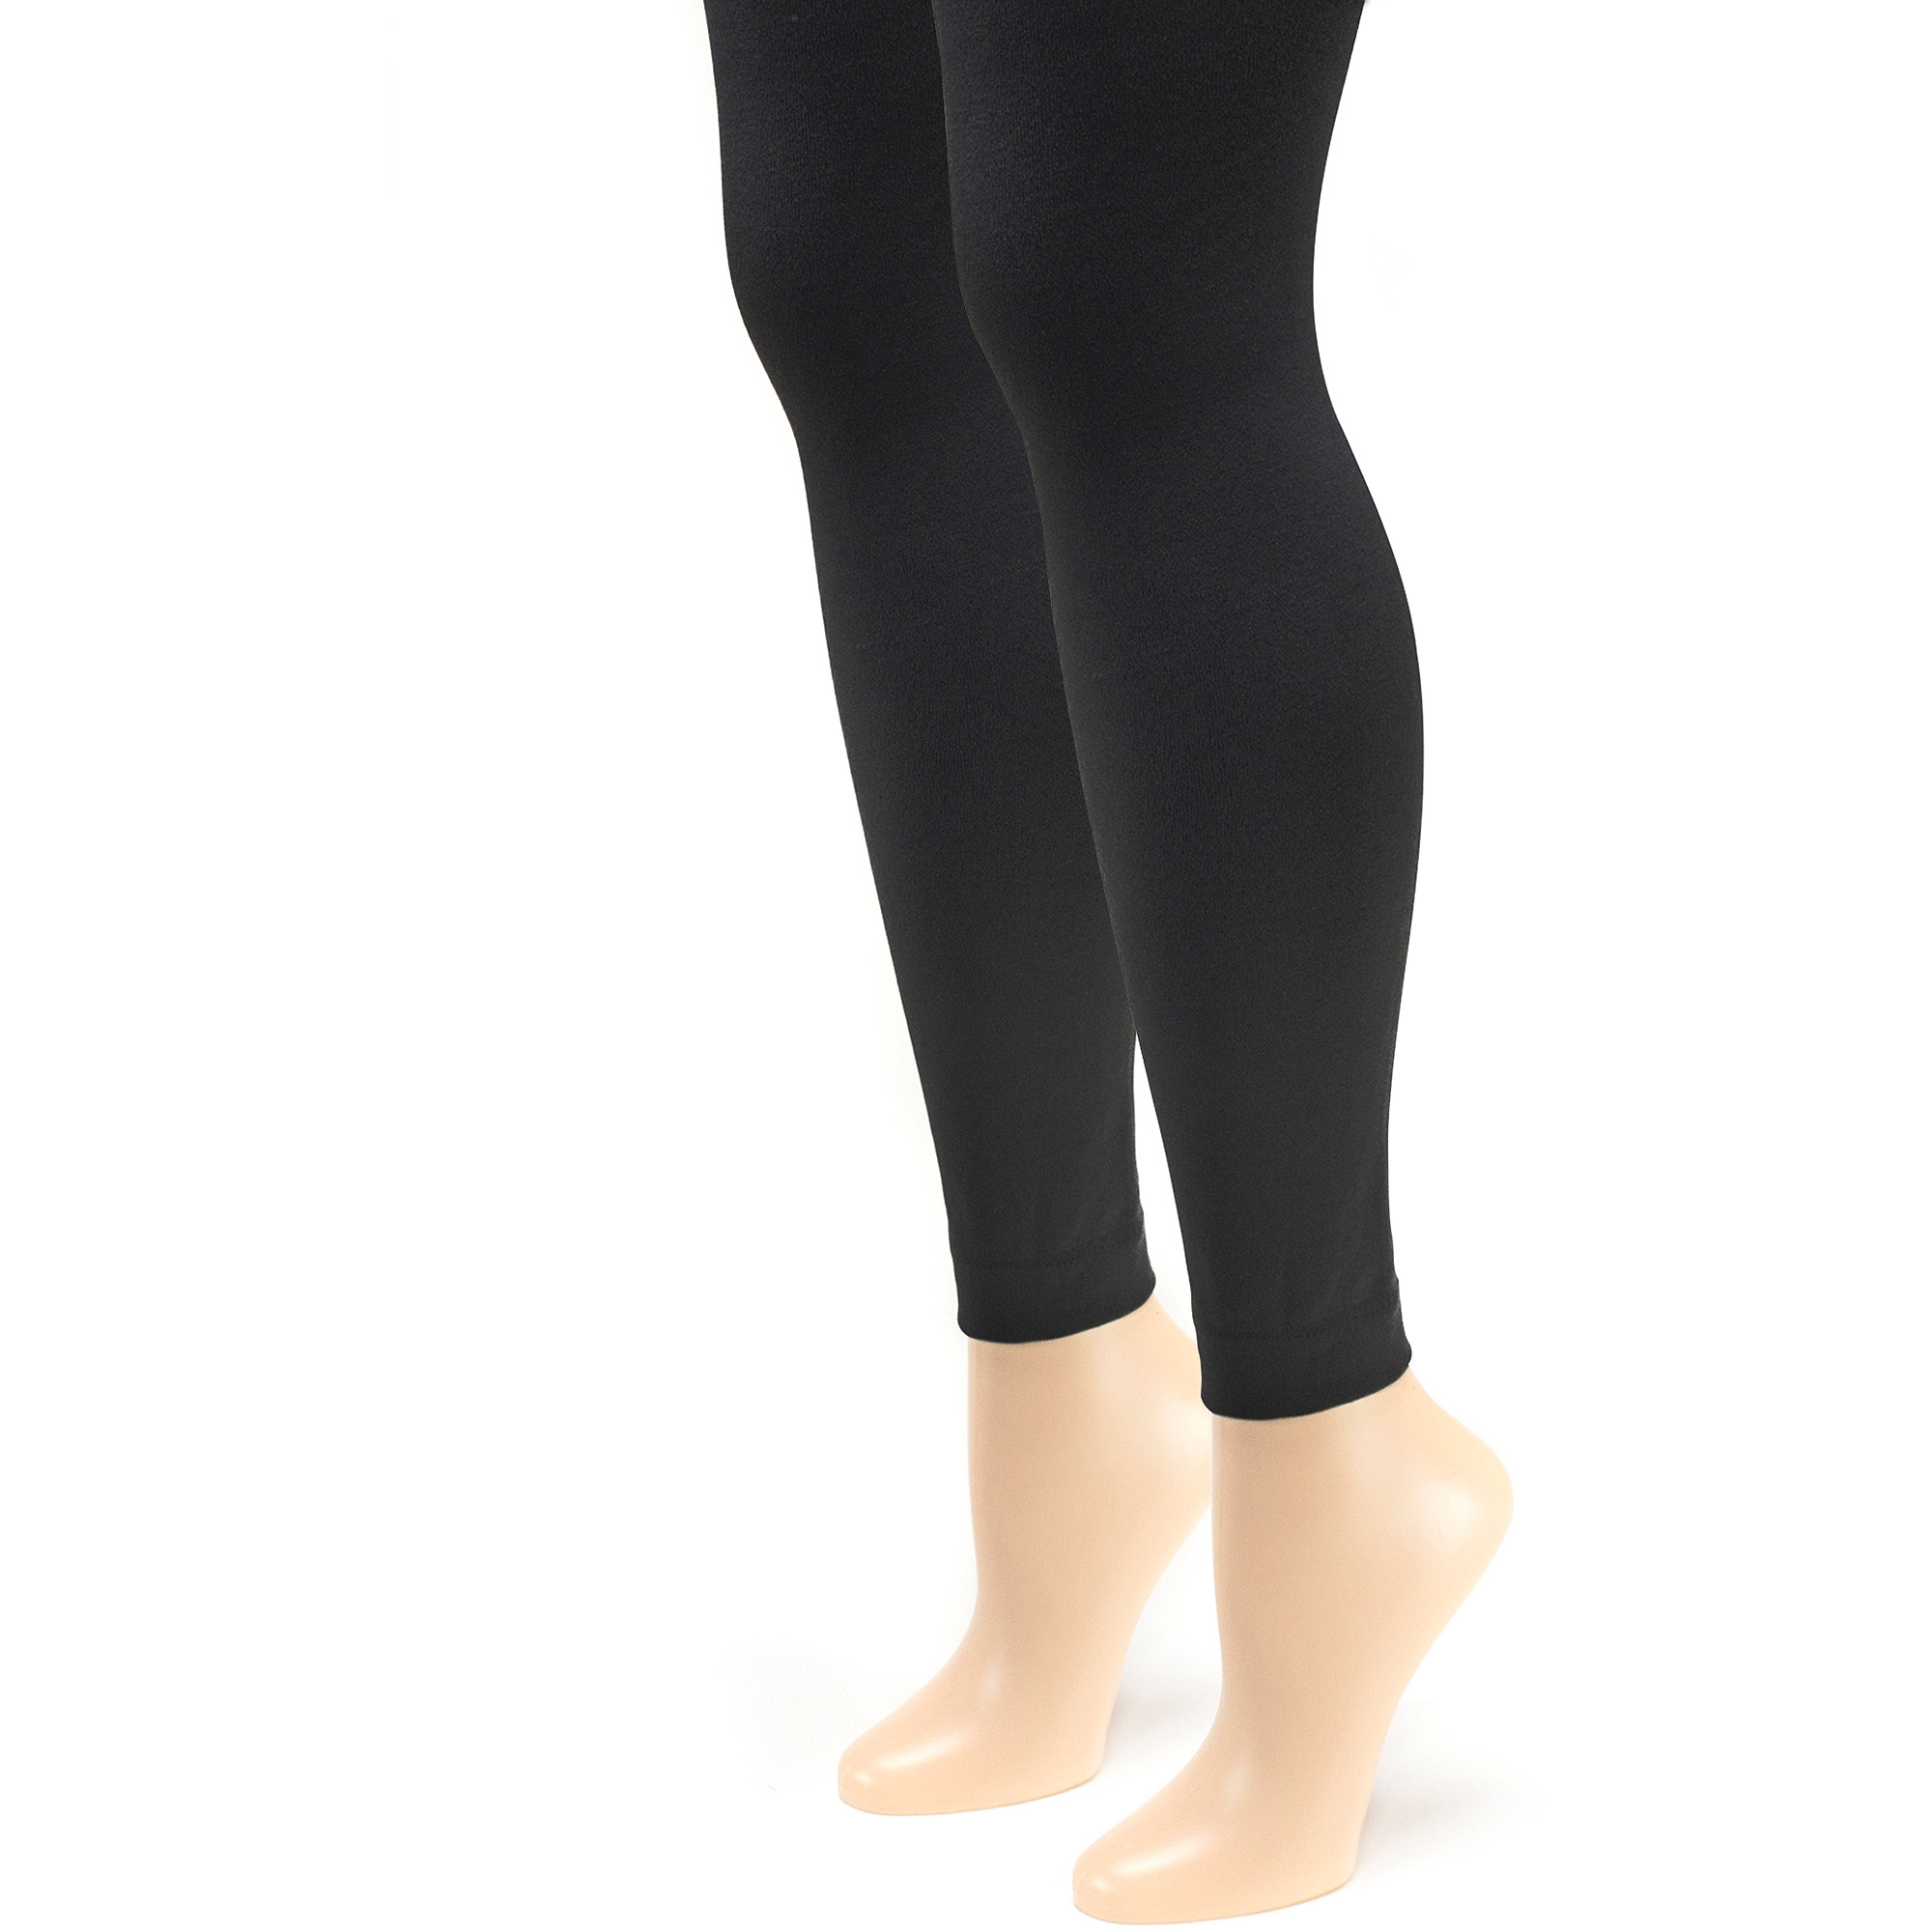 MUK LUKS Women's Fleece Lined 2-Pair Pack Footless Tights ...